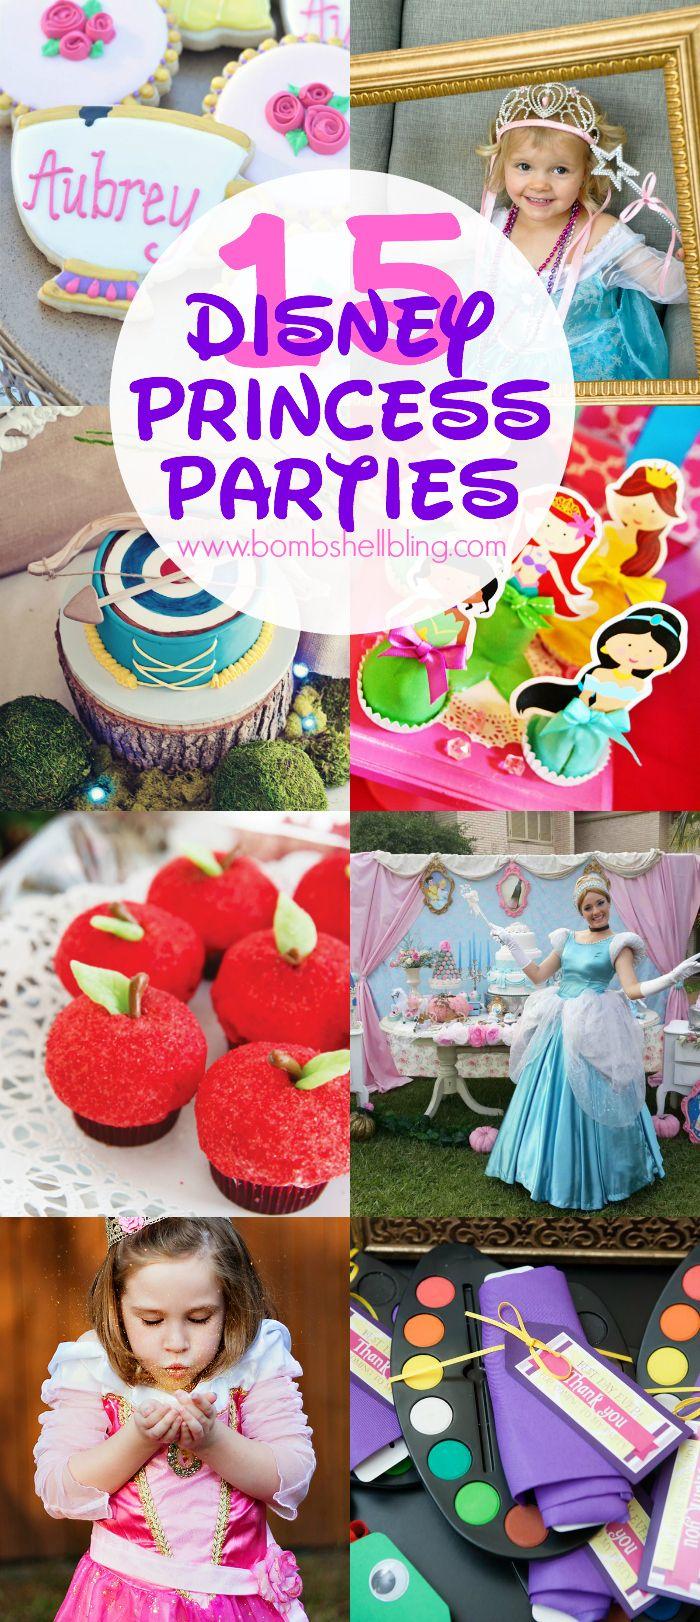 15 Perfect Disney Princess Parties - CUTEST! #disney #princess #disneyprincess